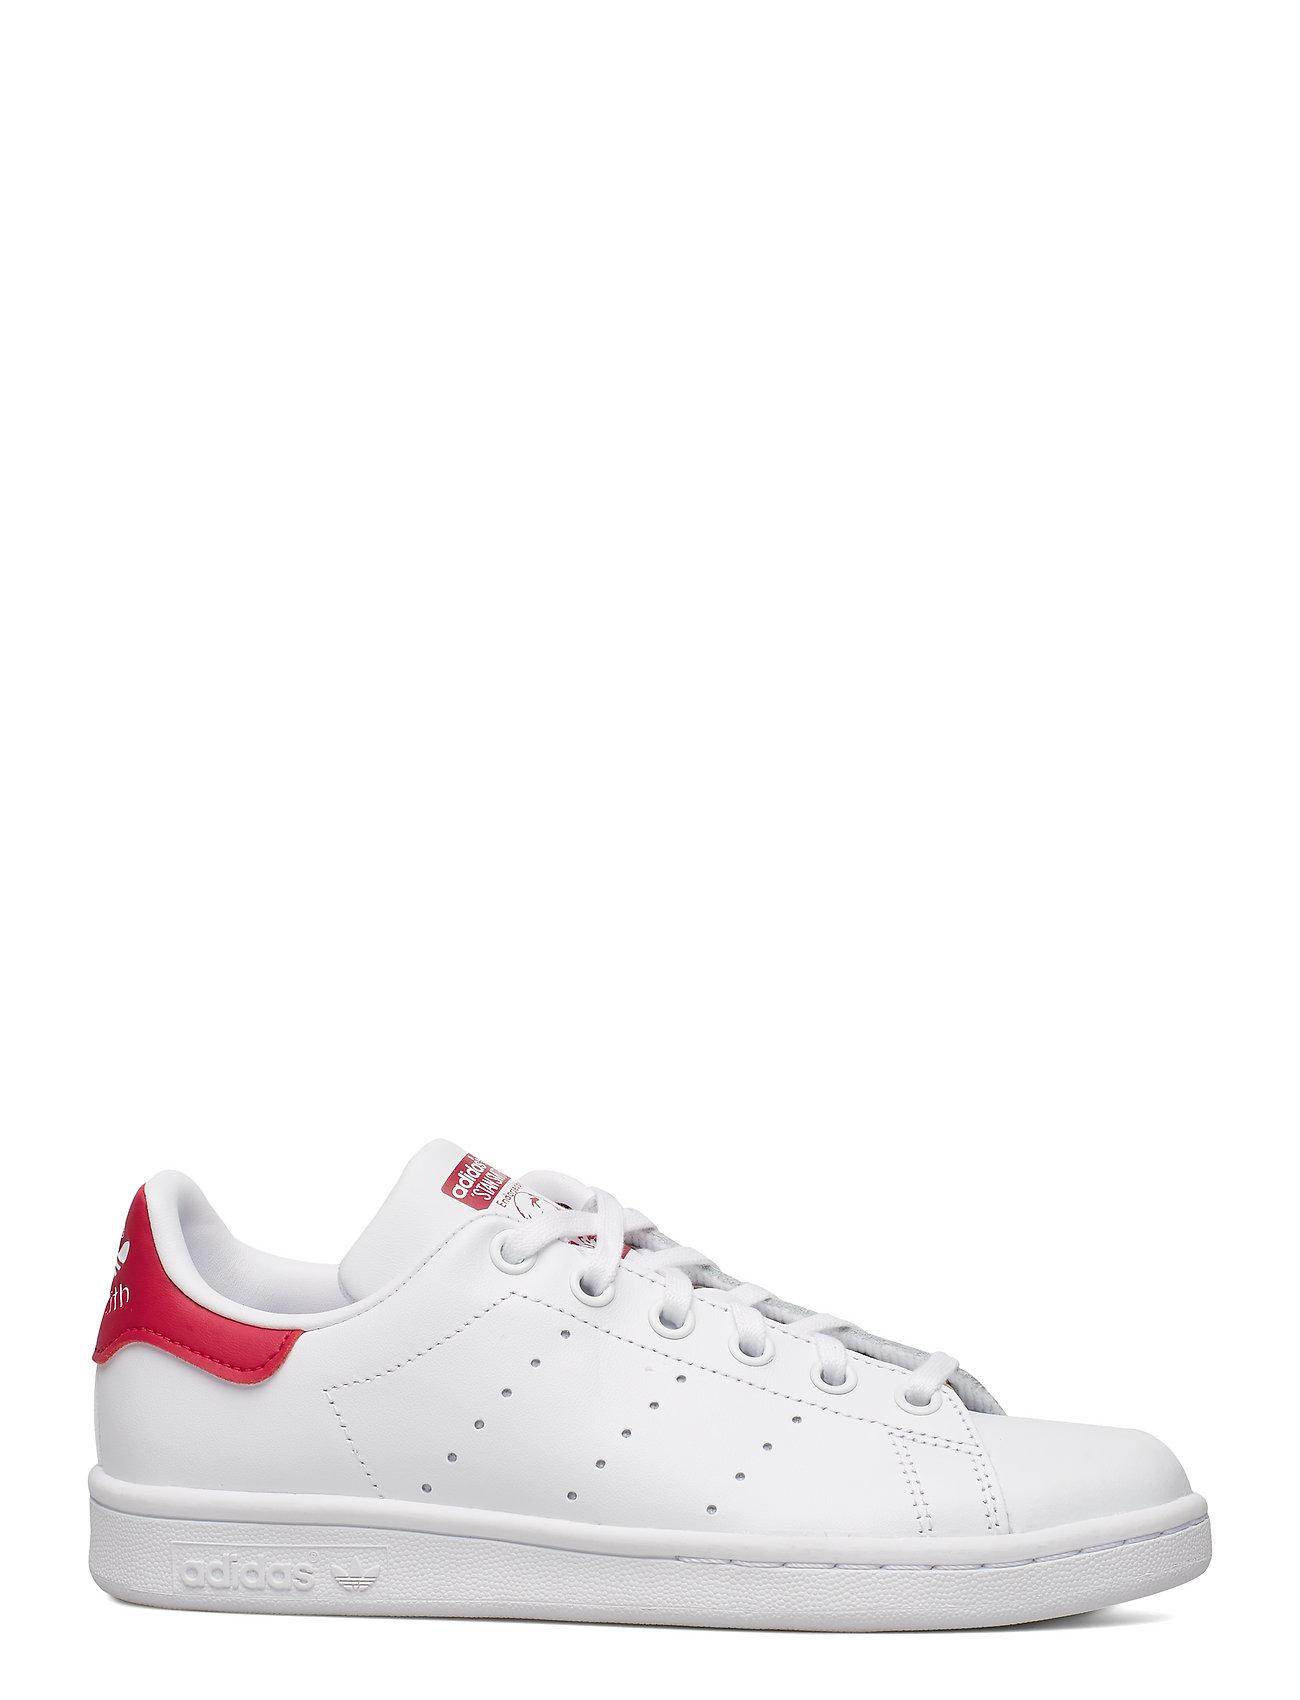 Stan Smith J Sneakers Sko Hvid Adidas Originals